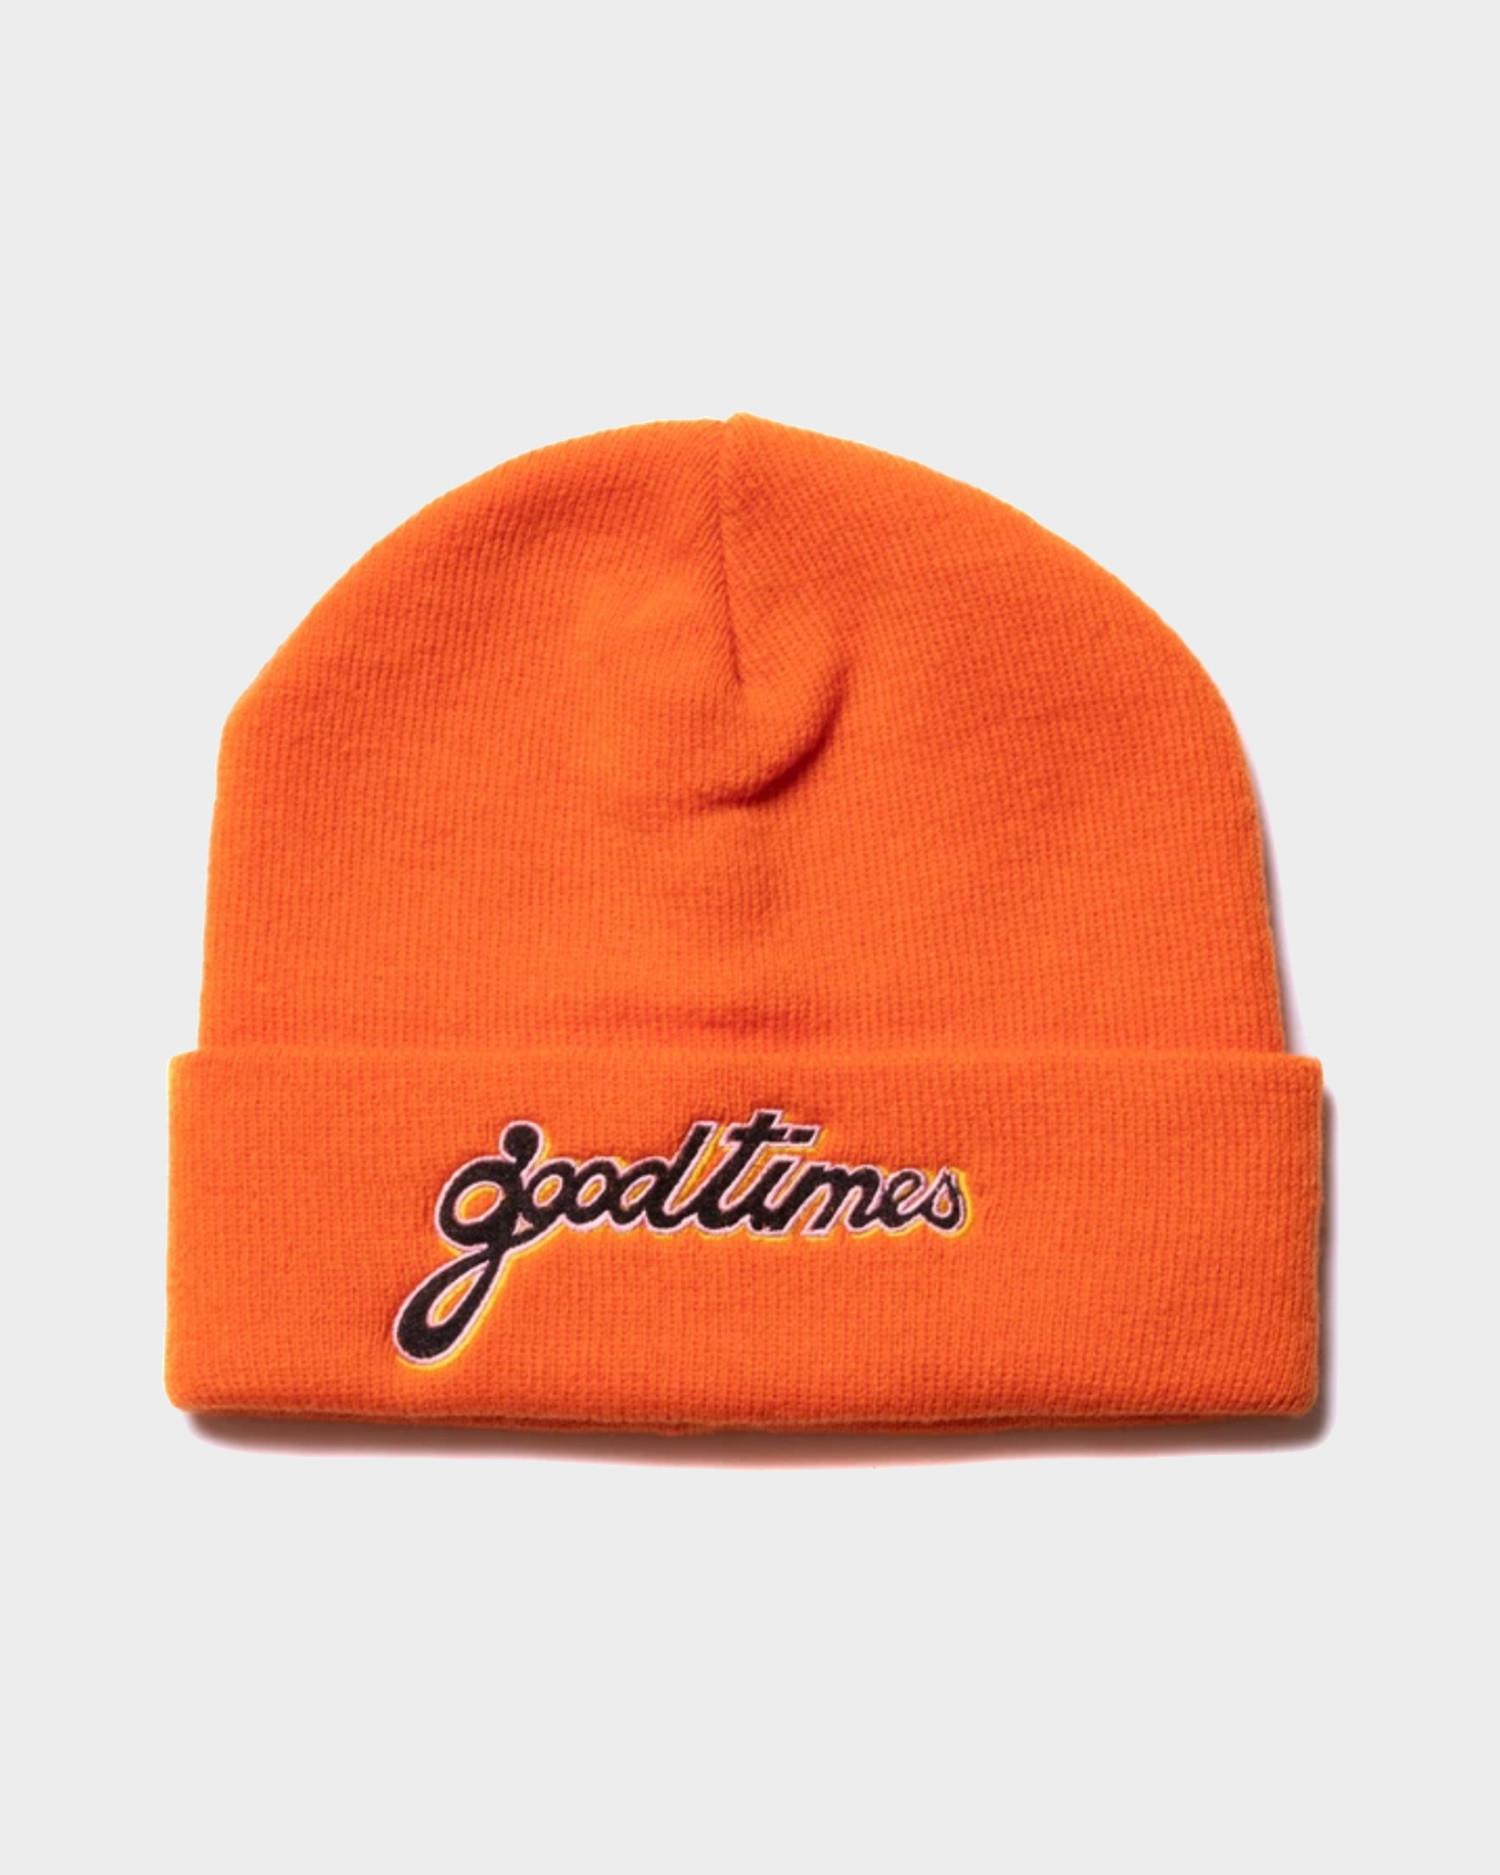 Have a good time Good Times beanie orange